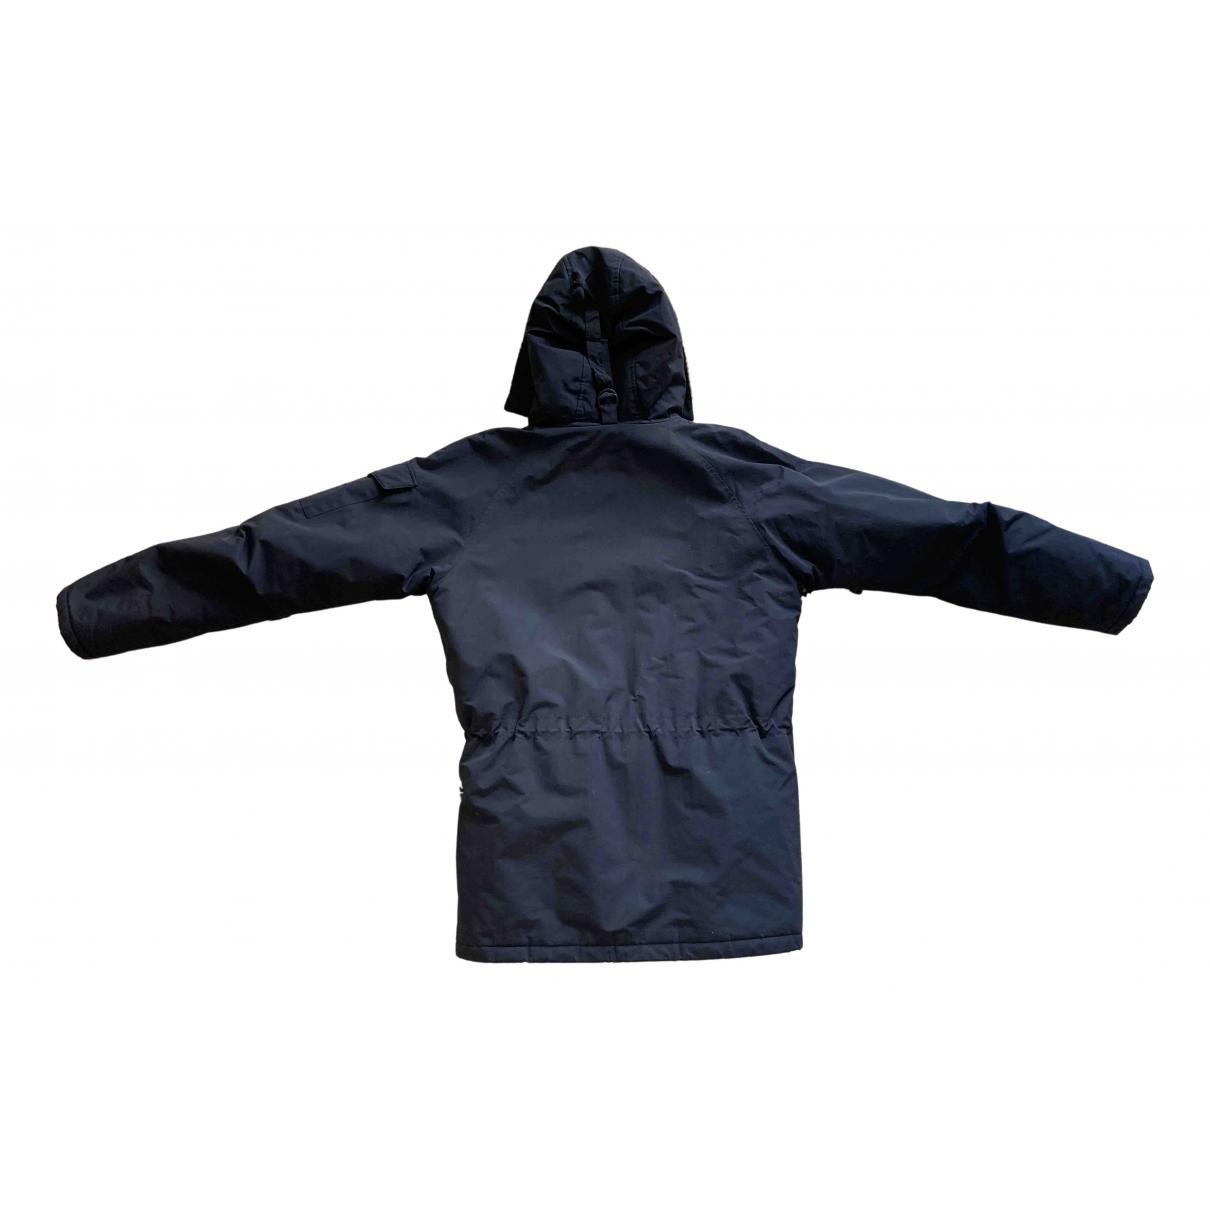 Carhartt Wip \N Black coat  for Men XL International